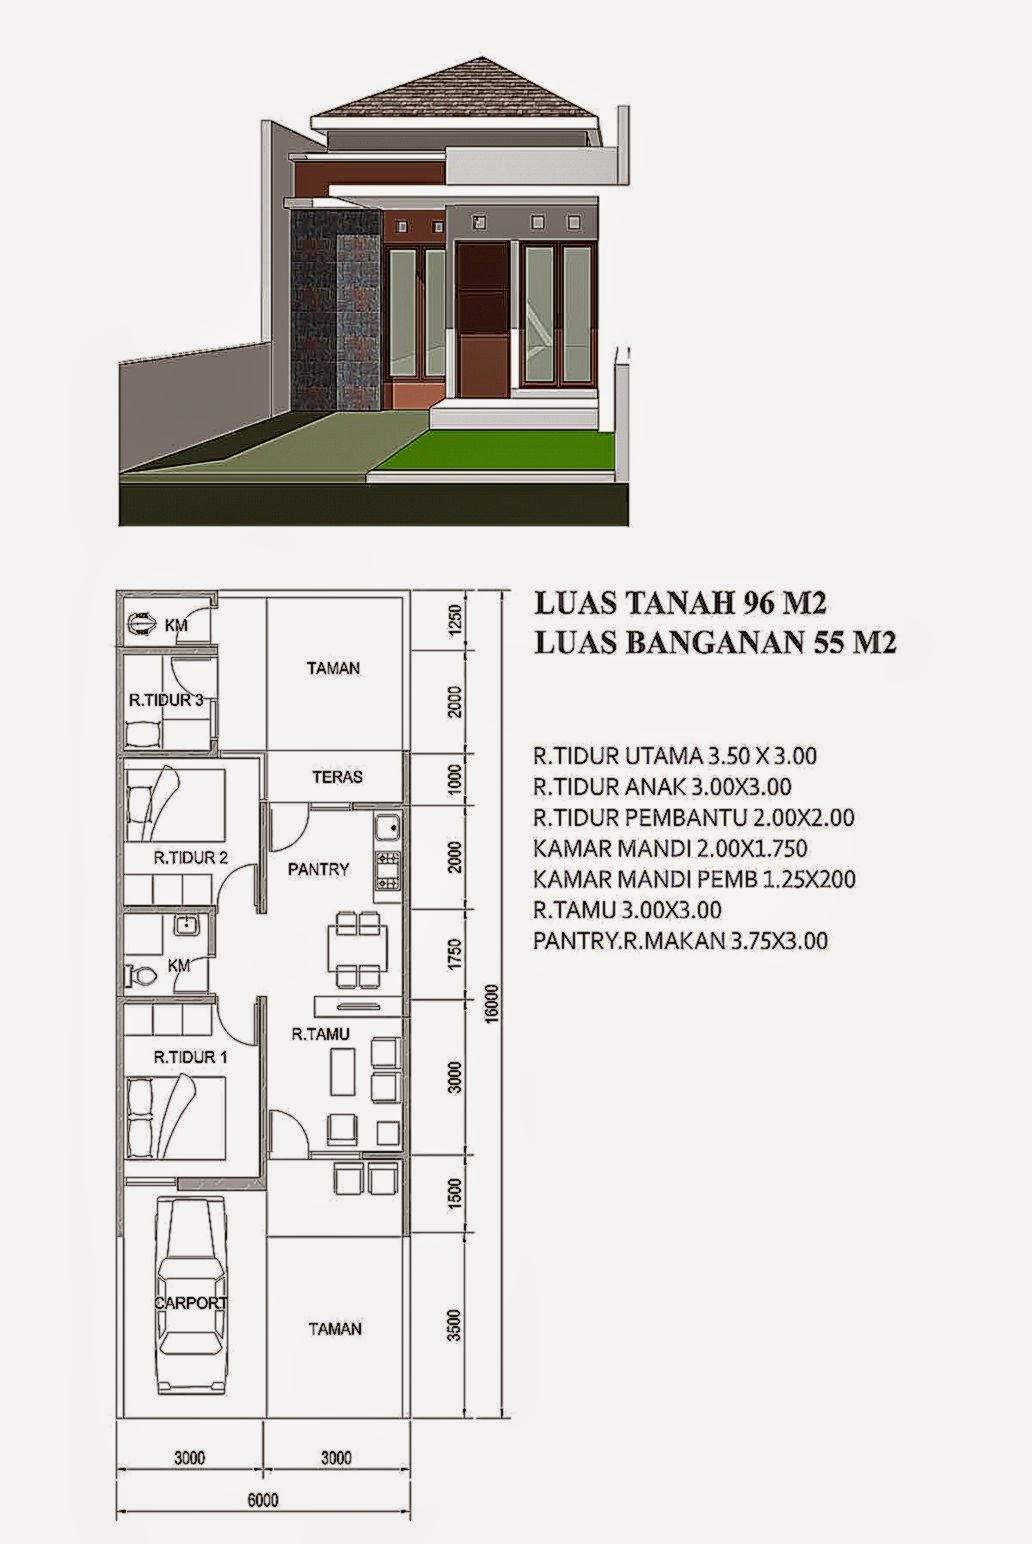 denah rumah minimalis sederhana gallery taman minimalis